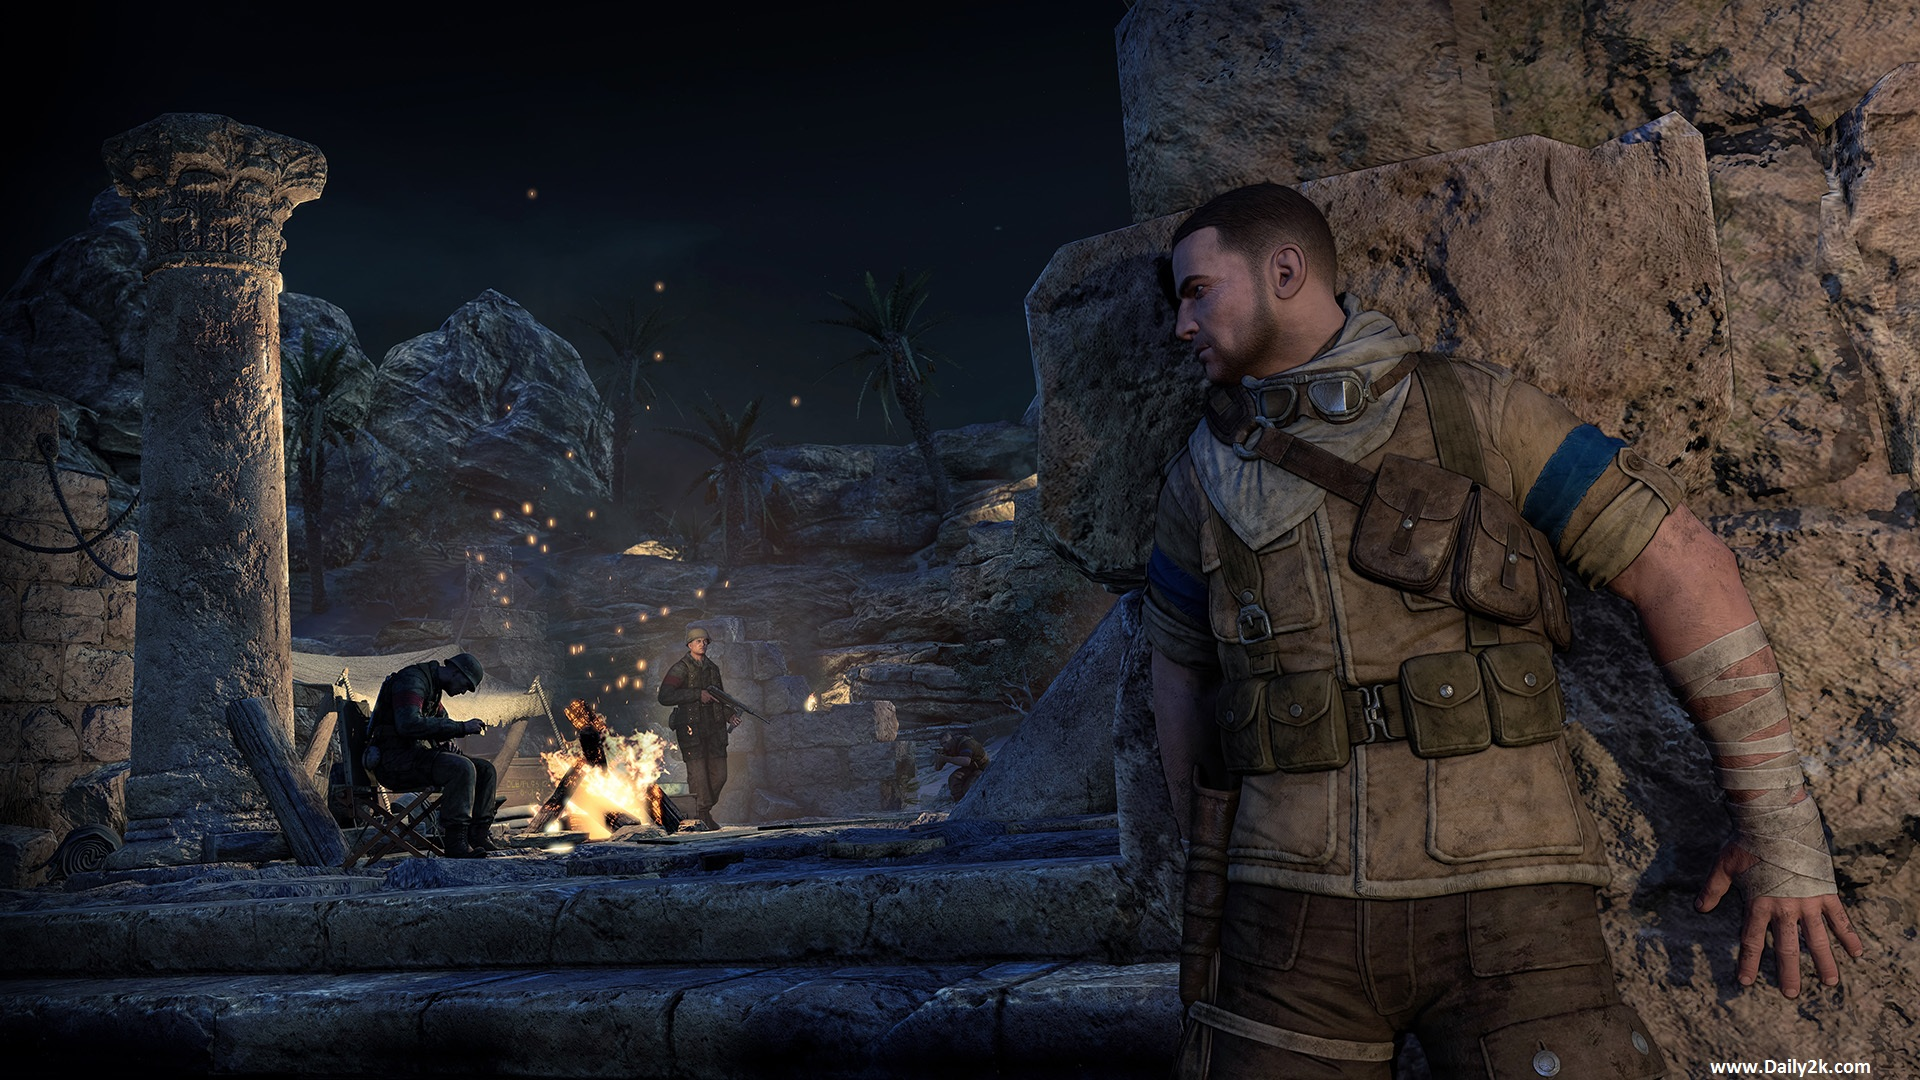 Sniper Elite III -Daily2k